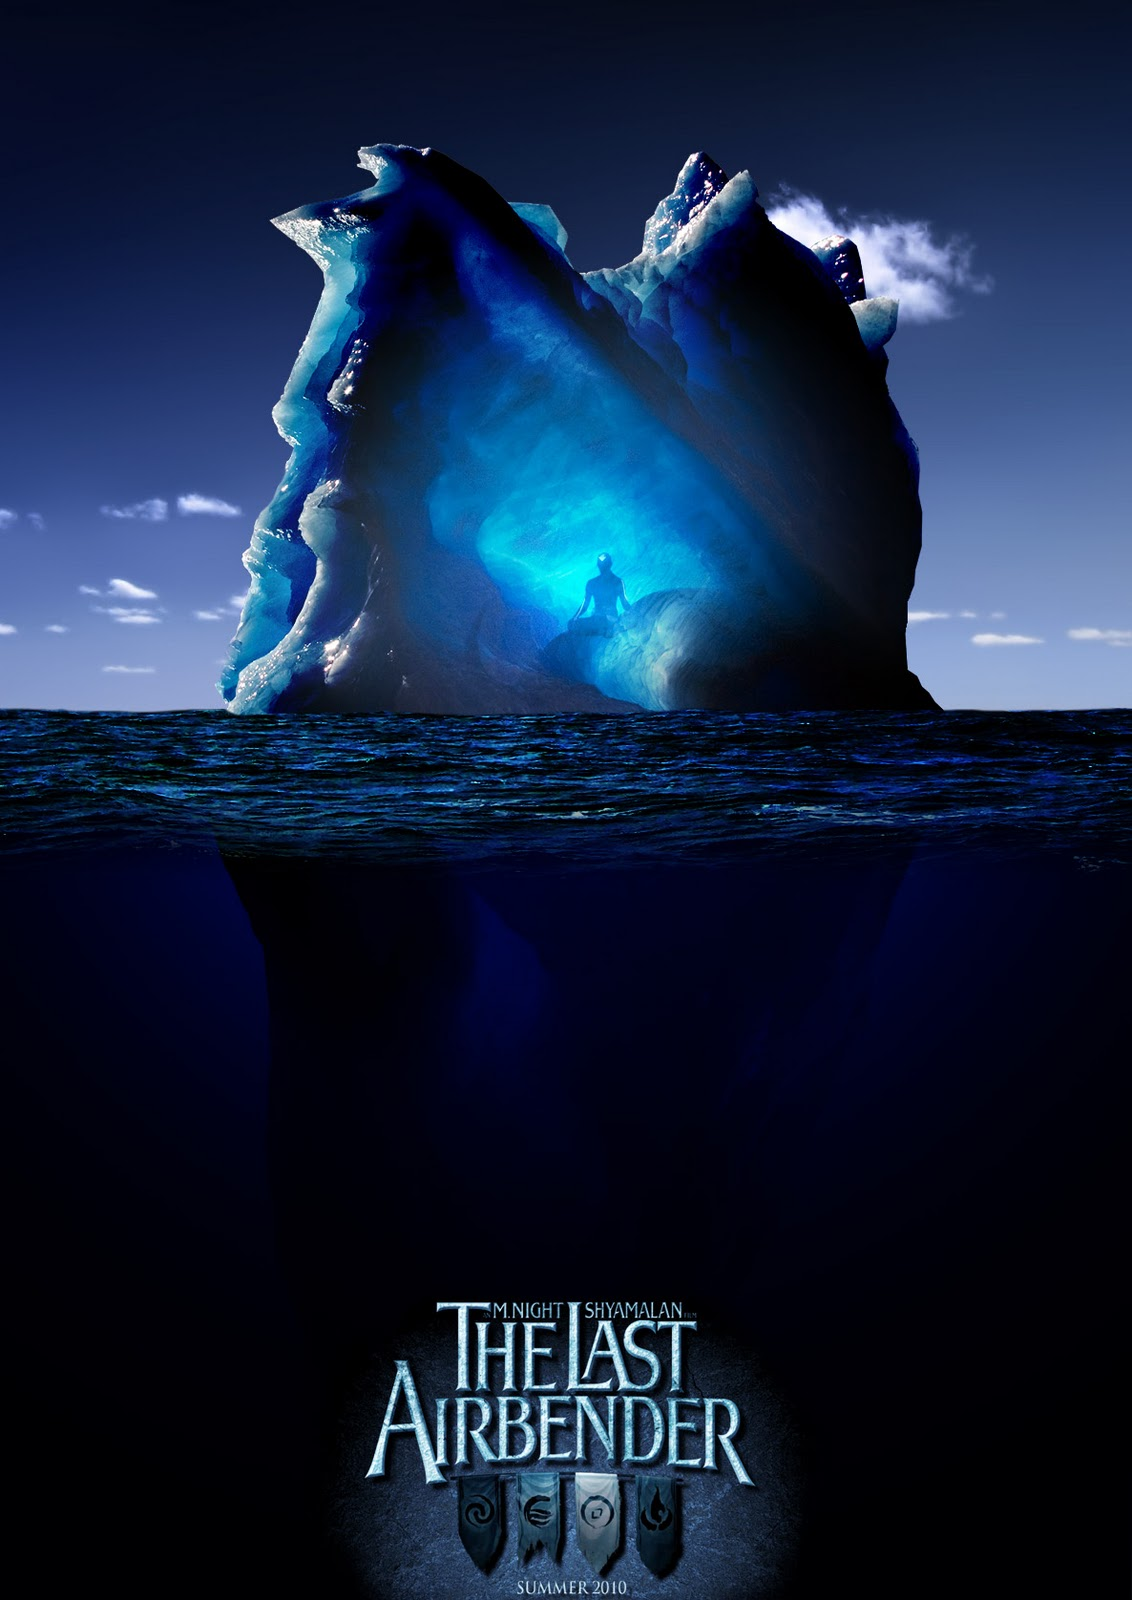 Movie Sense by FranchiseSaysSo: The Last Airbender (2010) The Last Airbender 2 Movie Go Stream